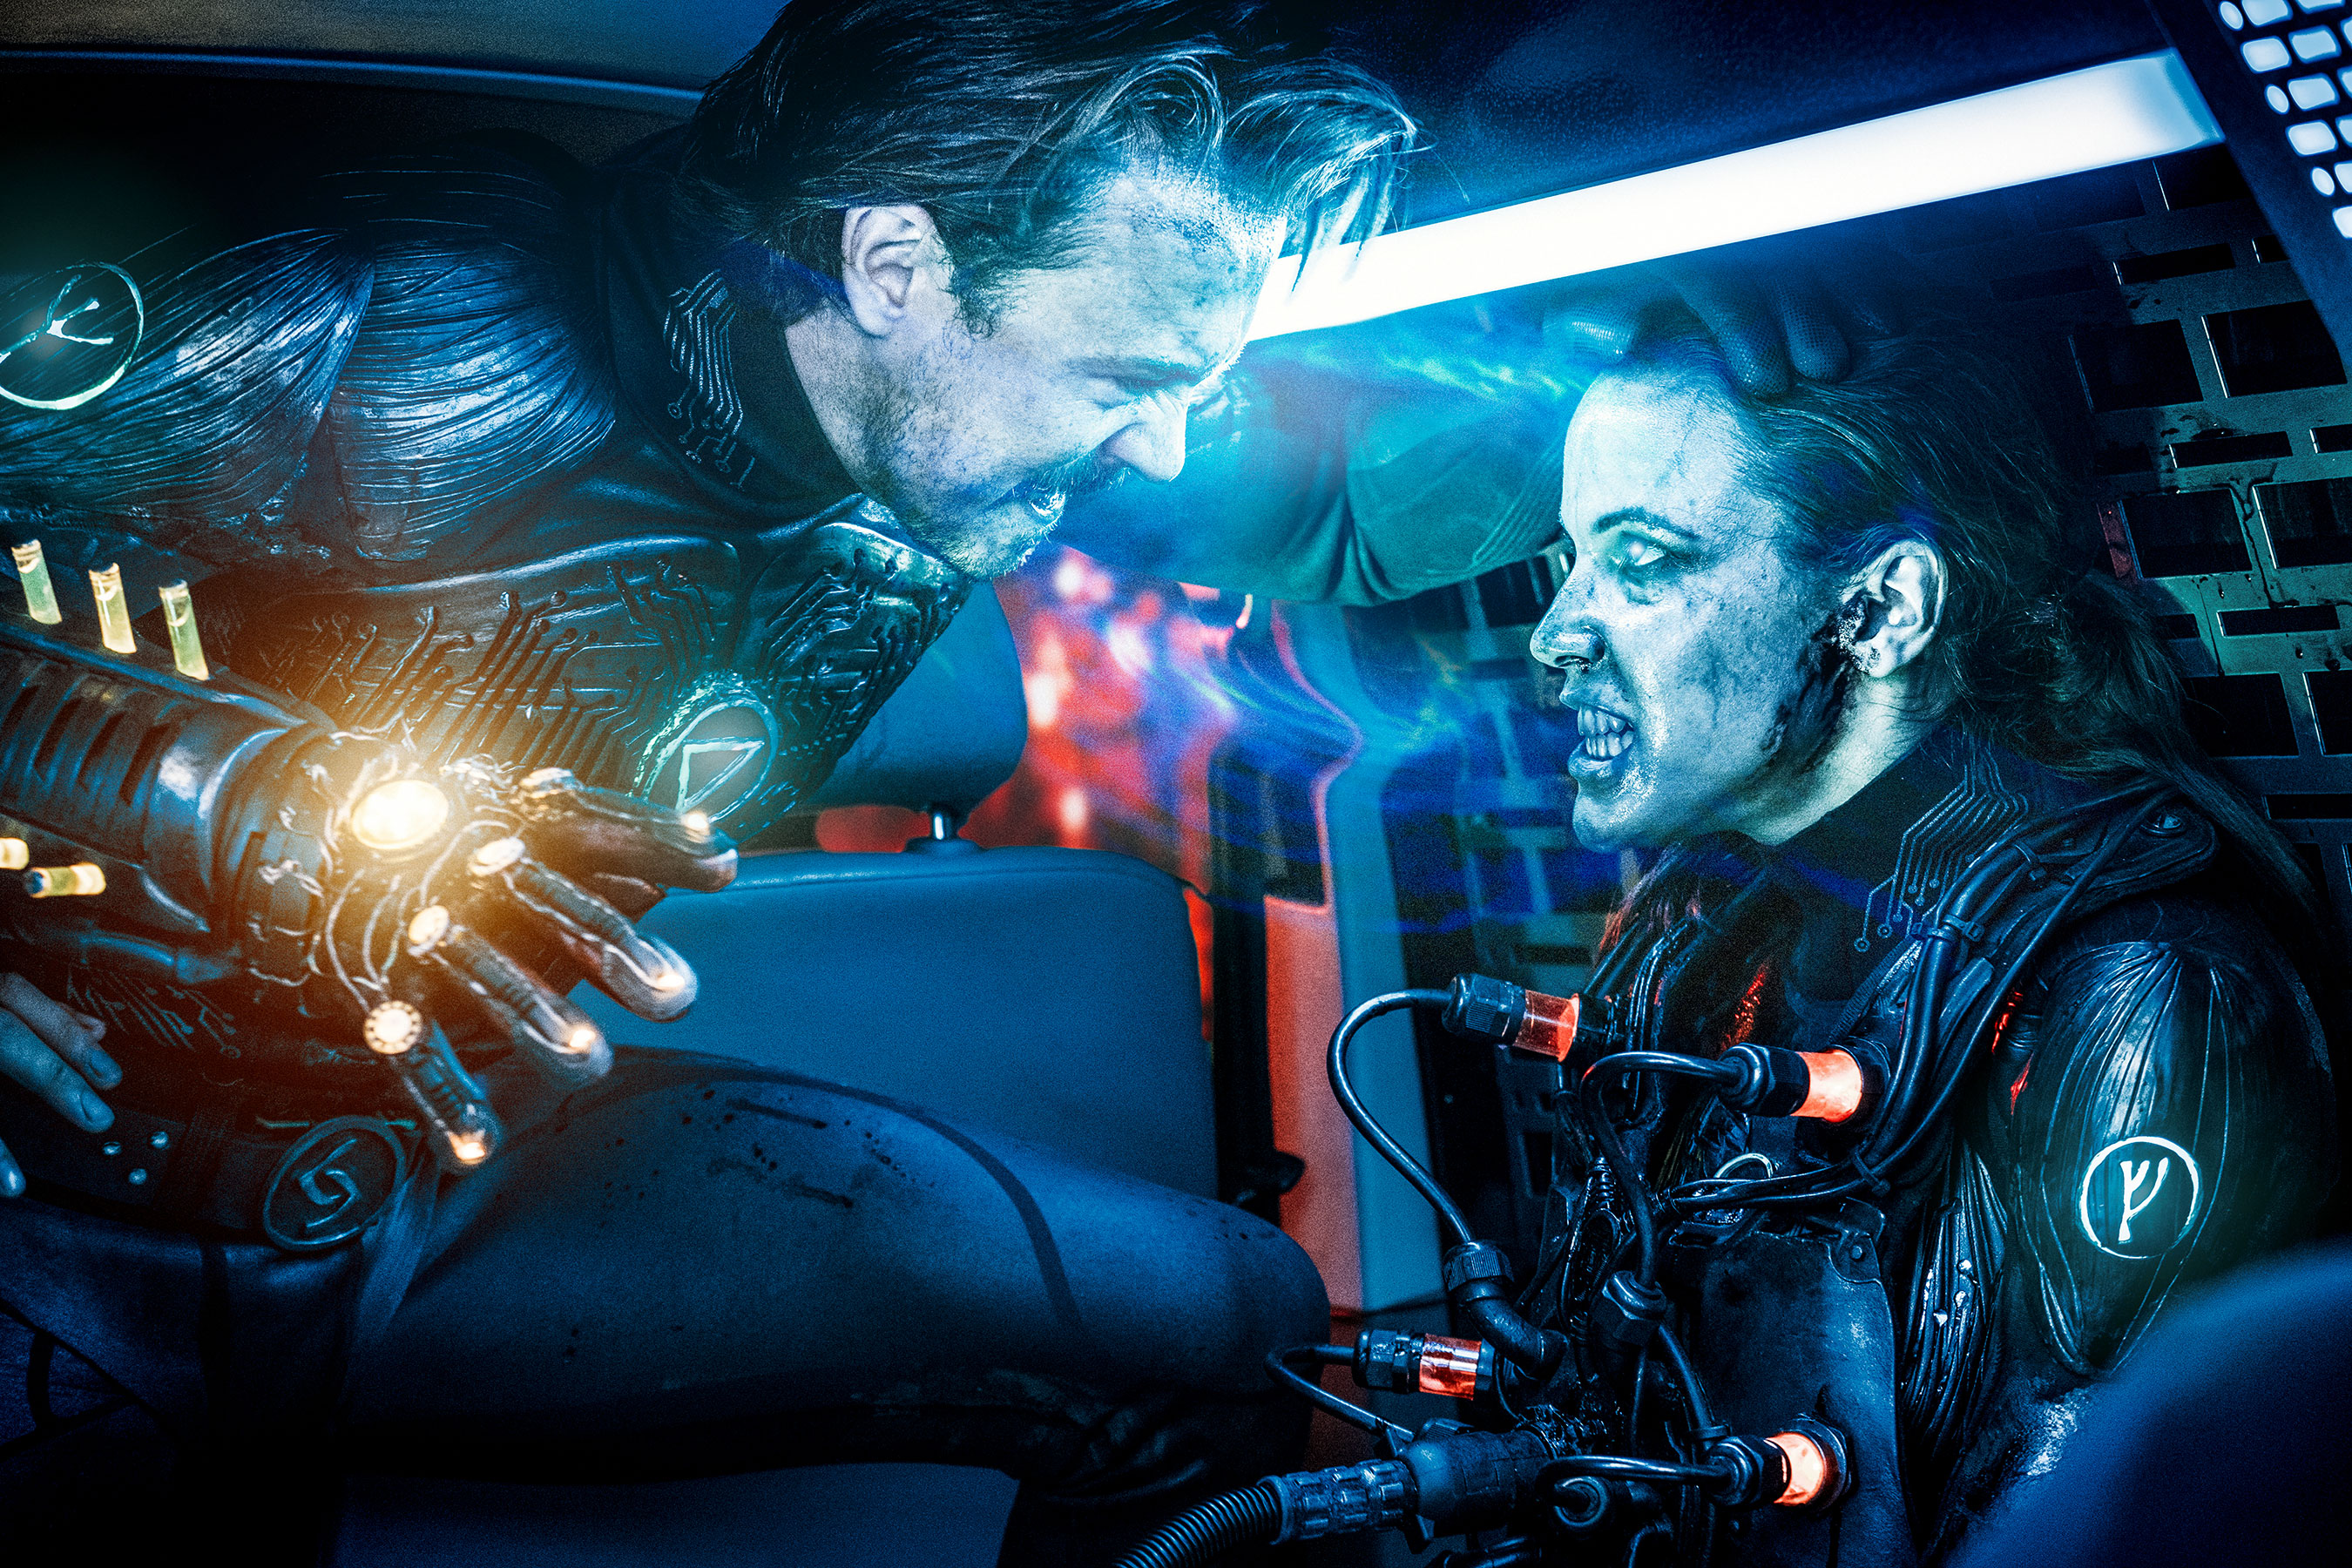 Interview: Director/Co-Writer Kiah Roache-Turner & Co-Writer Tristan Roache-Turner for NEKROTRONIC